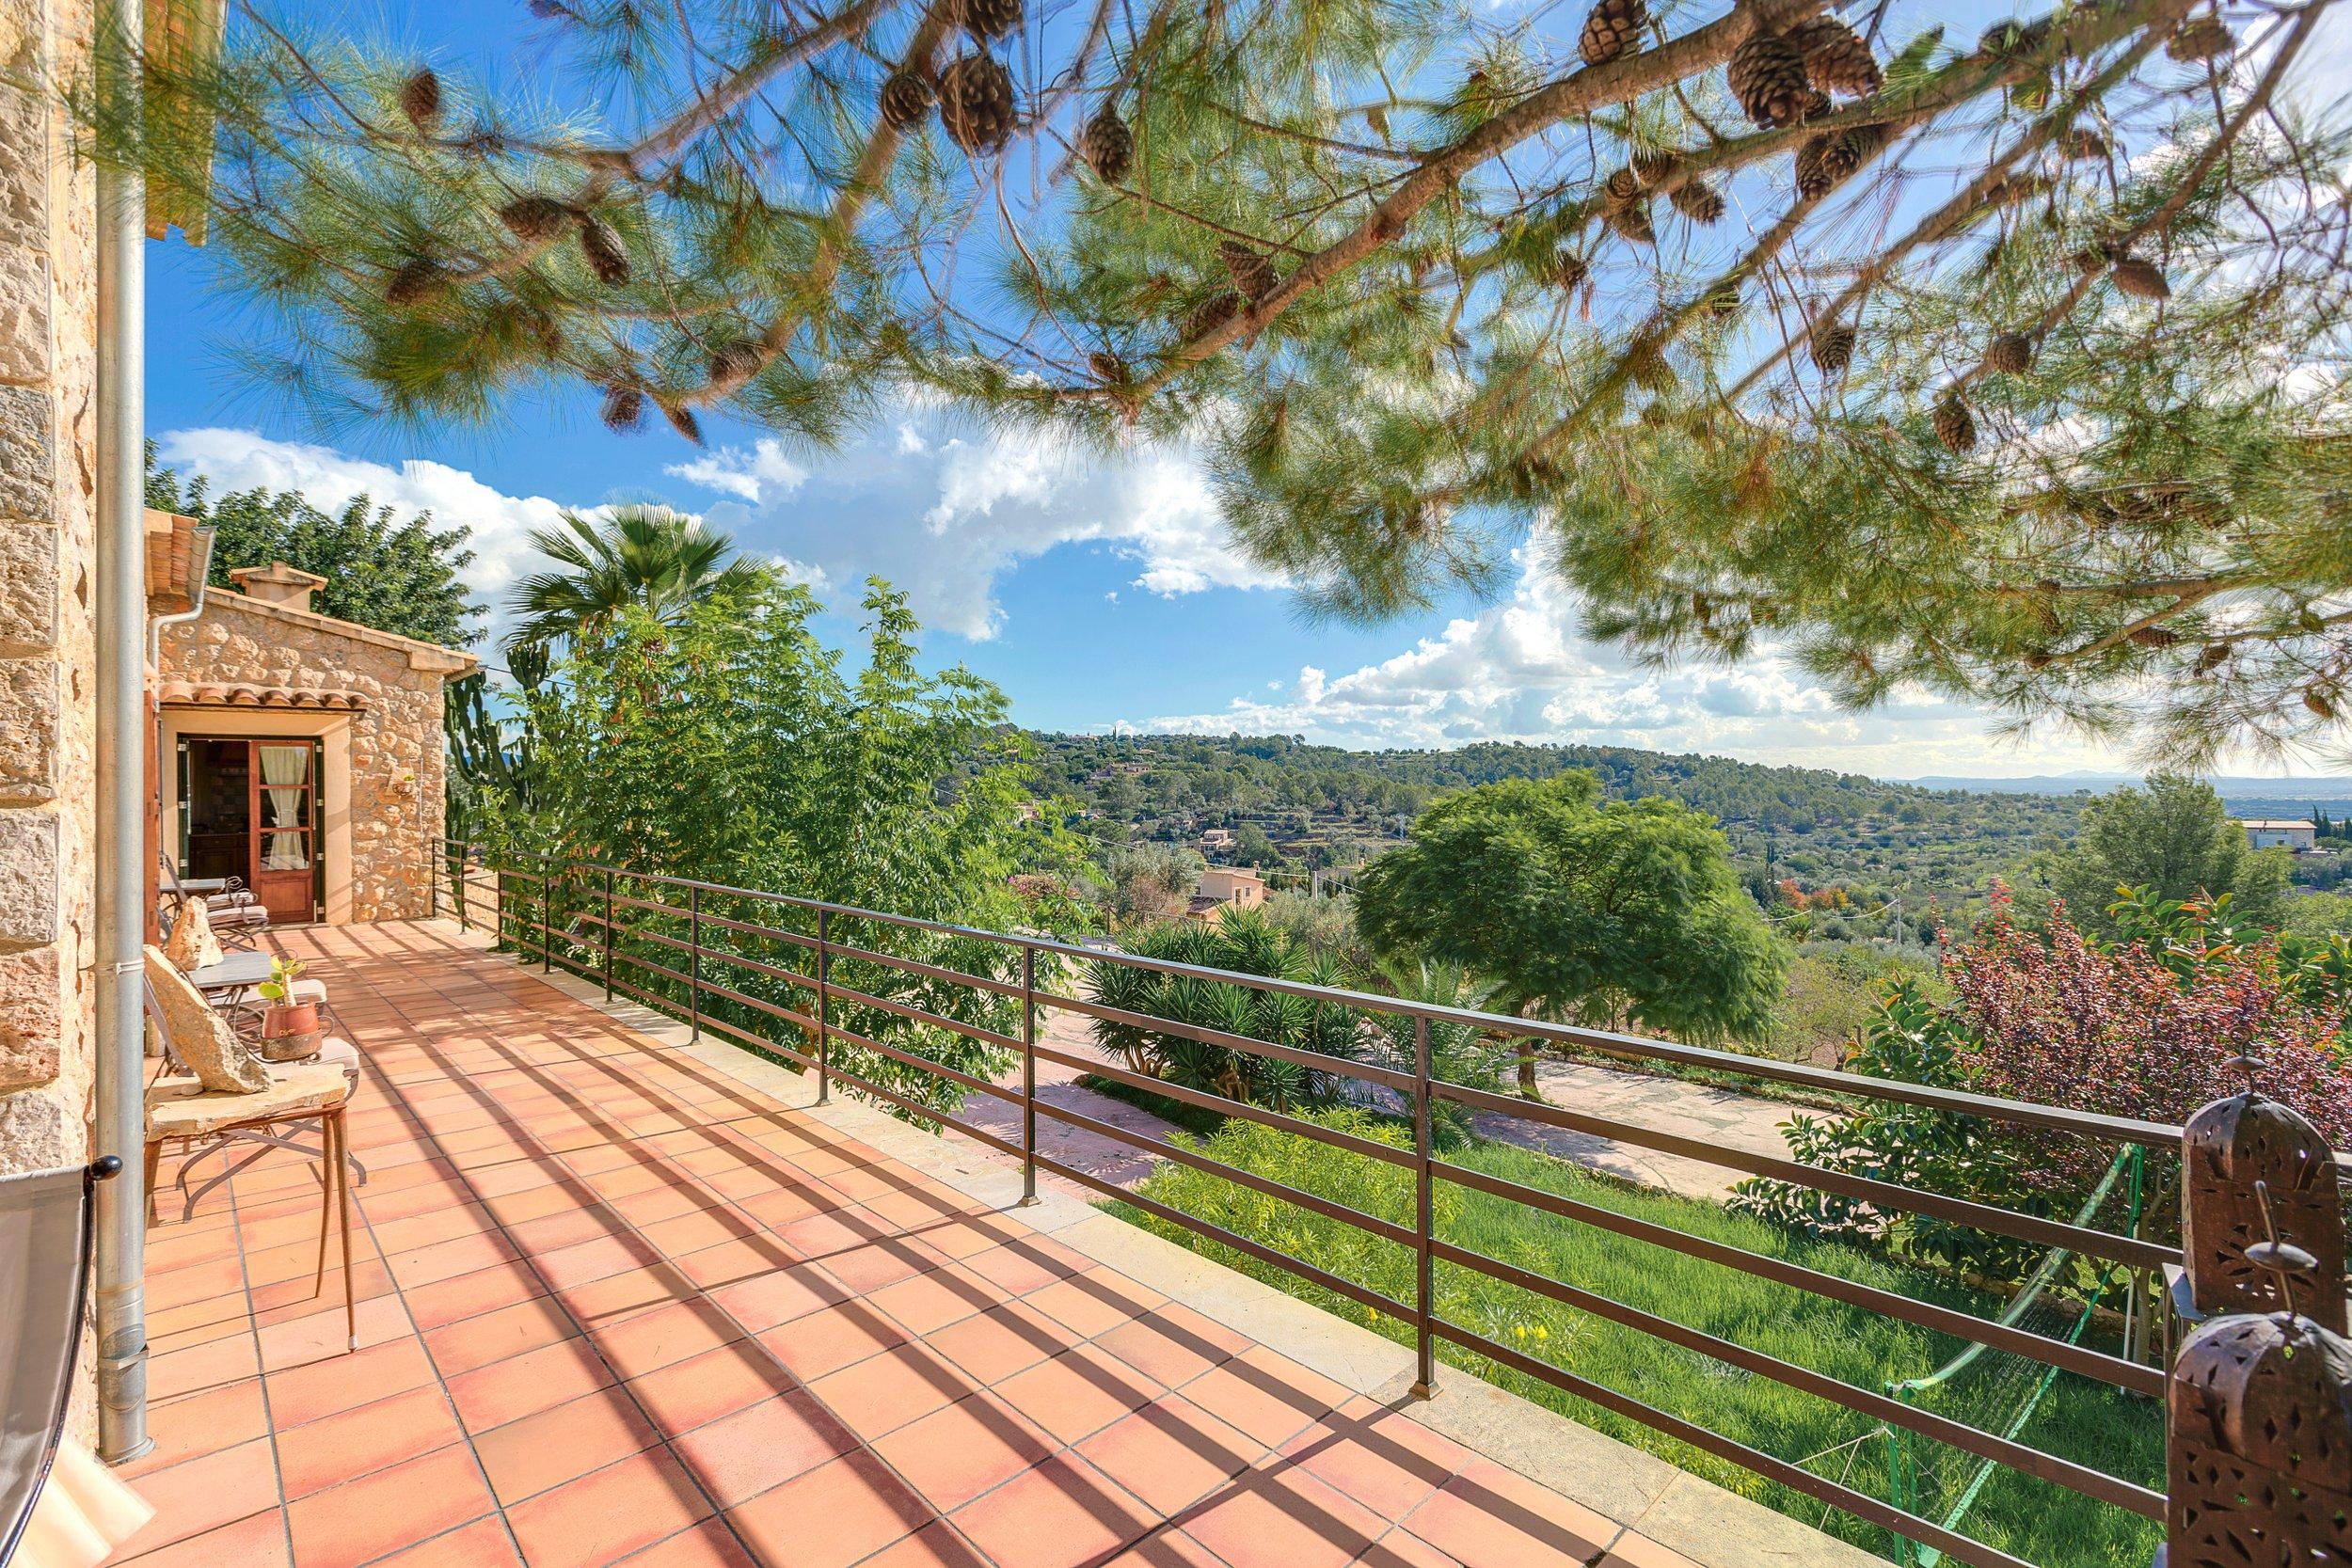 Maison de vacances Villa Cirera in Alaro (2611793), Alaro, Majorque, Iles Baléares, Espagne, image 10